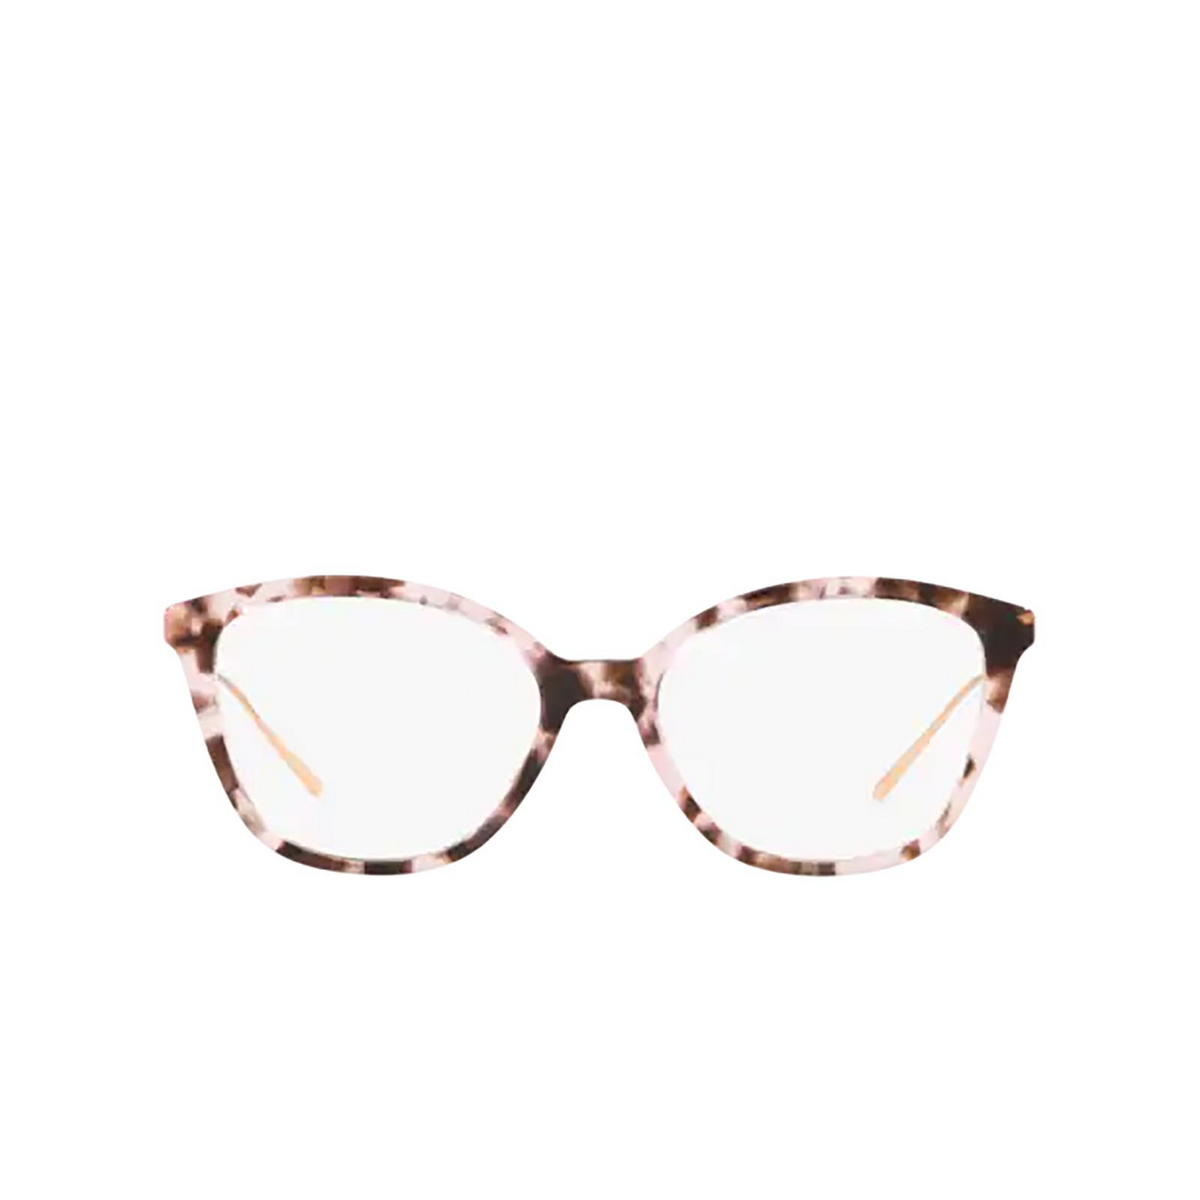 Prada® Square Eyeglasses: PR 11VV color Pink Havana ROJ1O1 - front view.